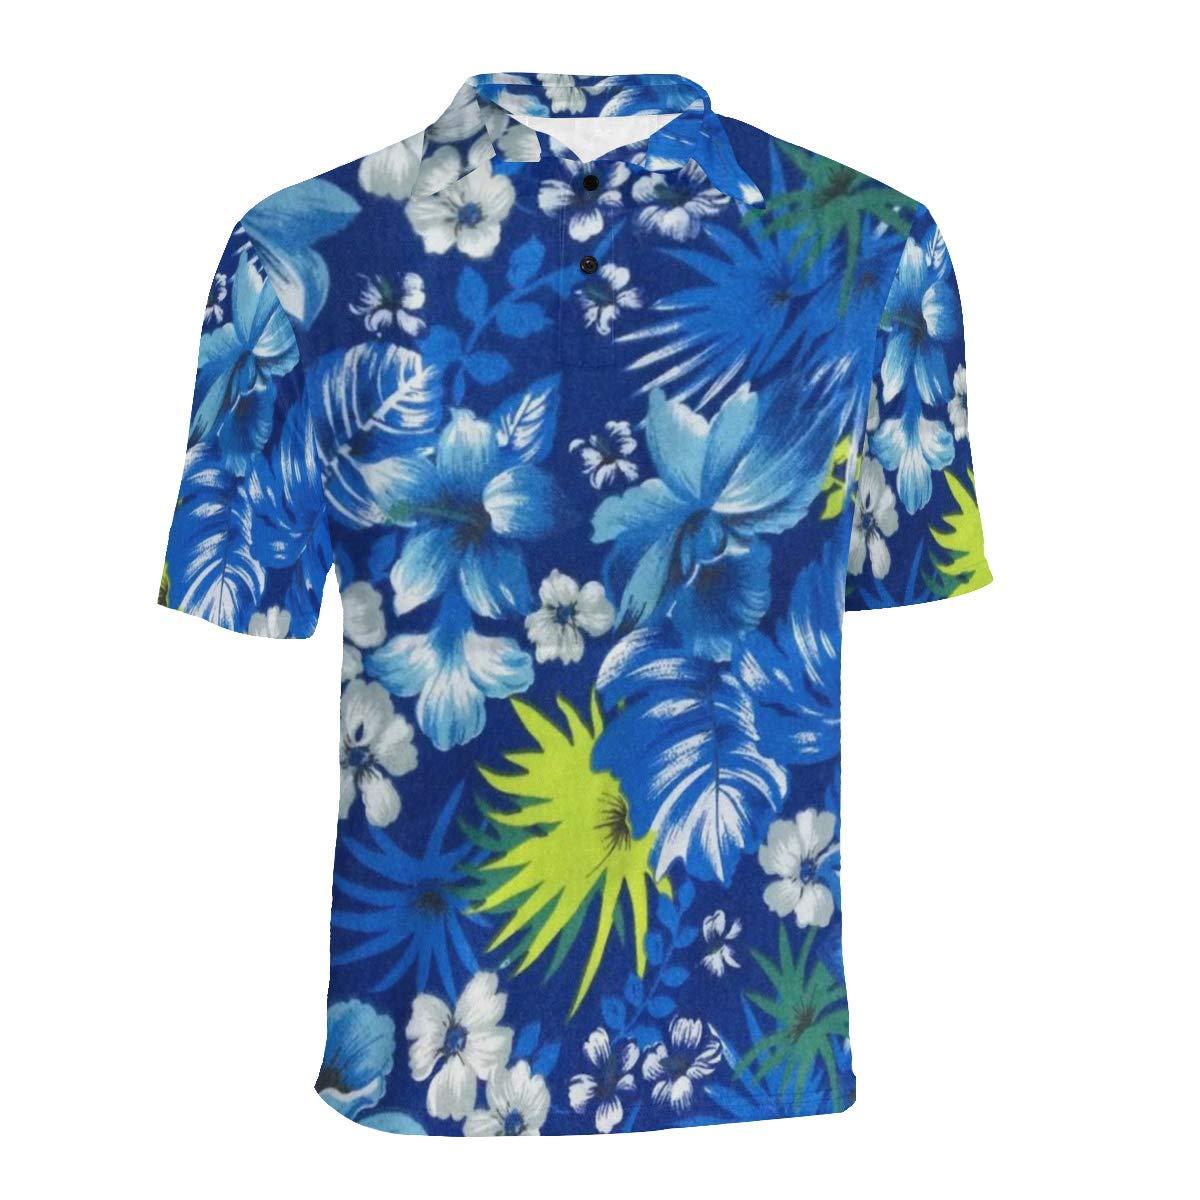 UlanLi Short Sleeve Blue Leave Mens All Over Print Polo Shirt